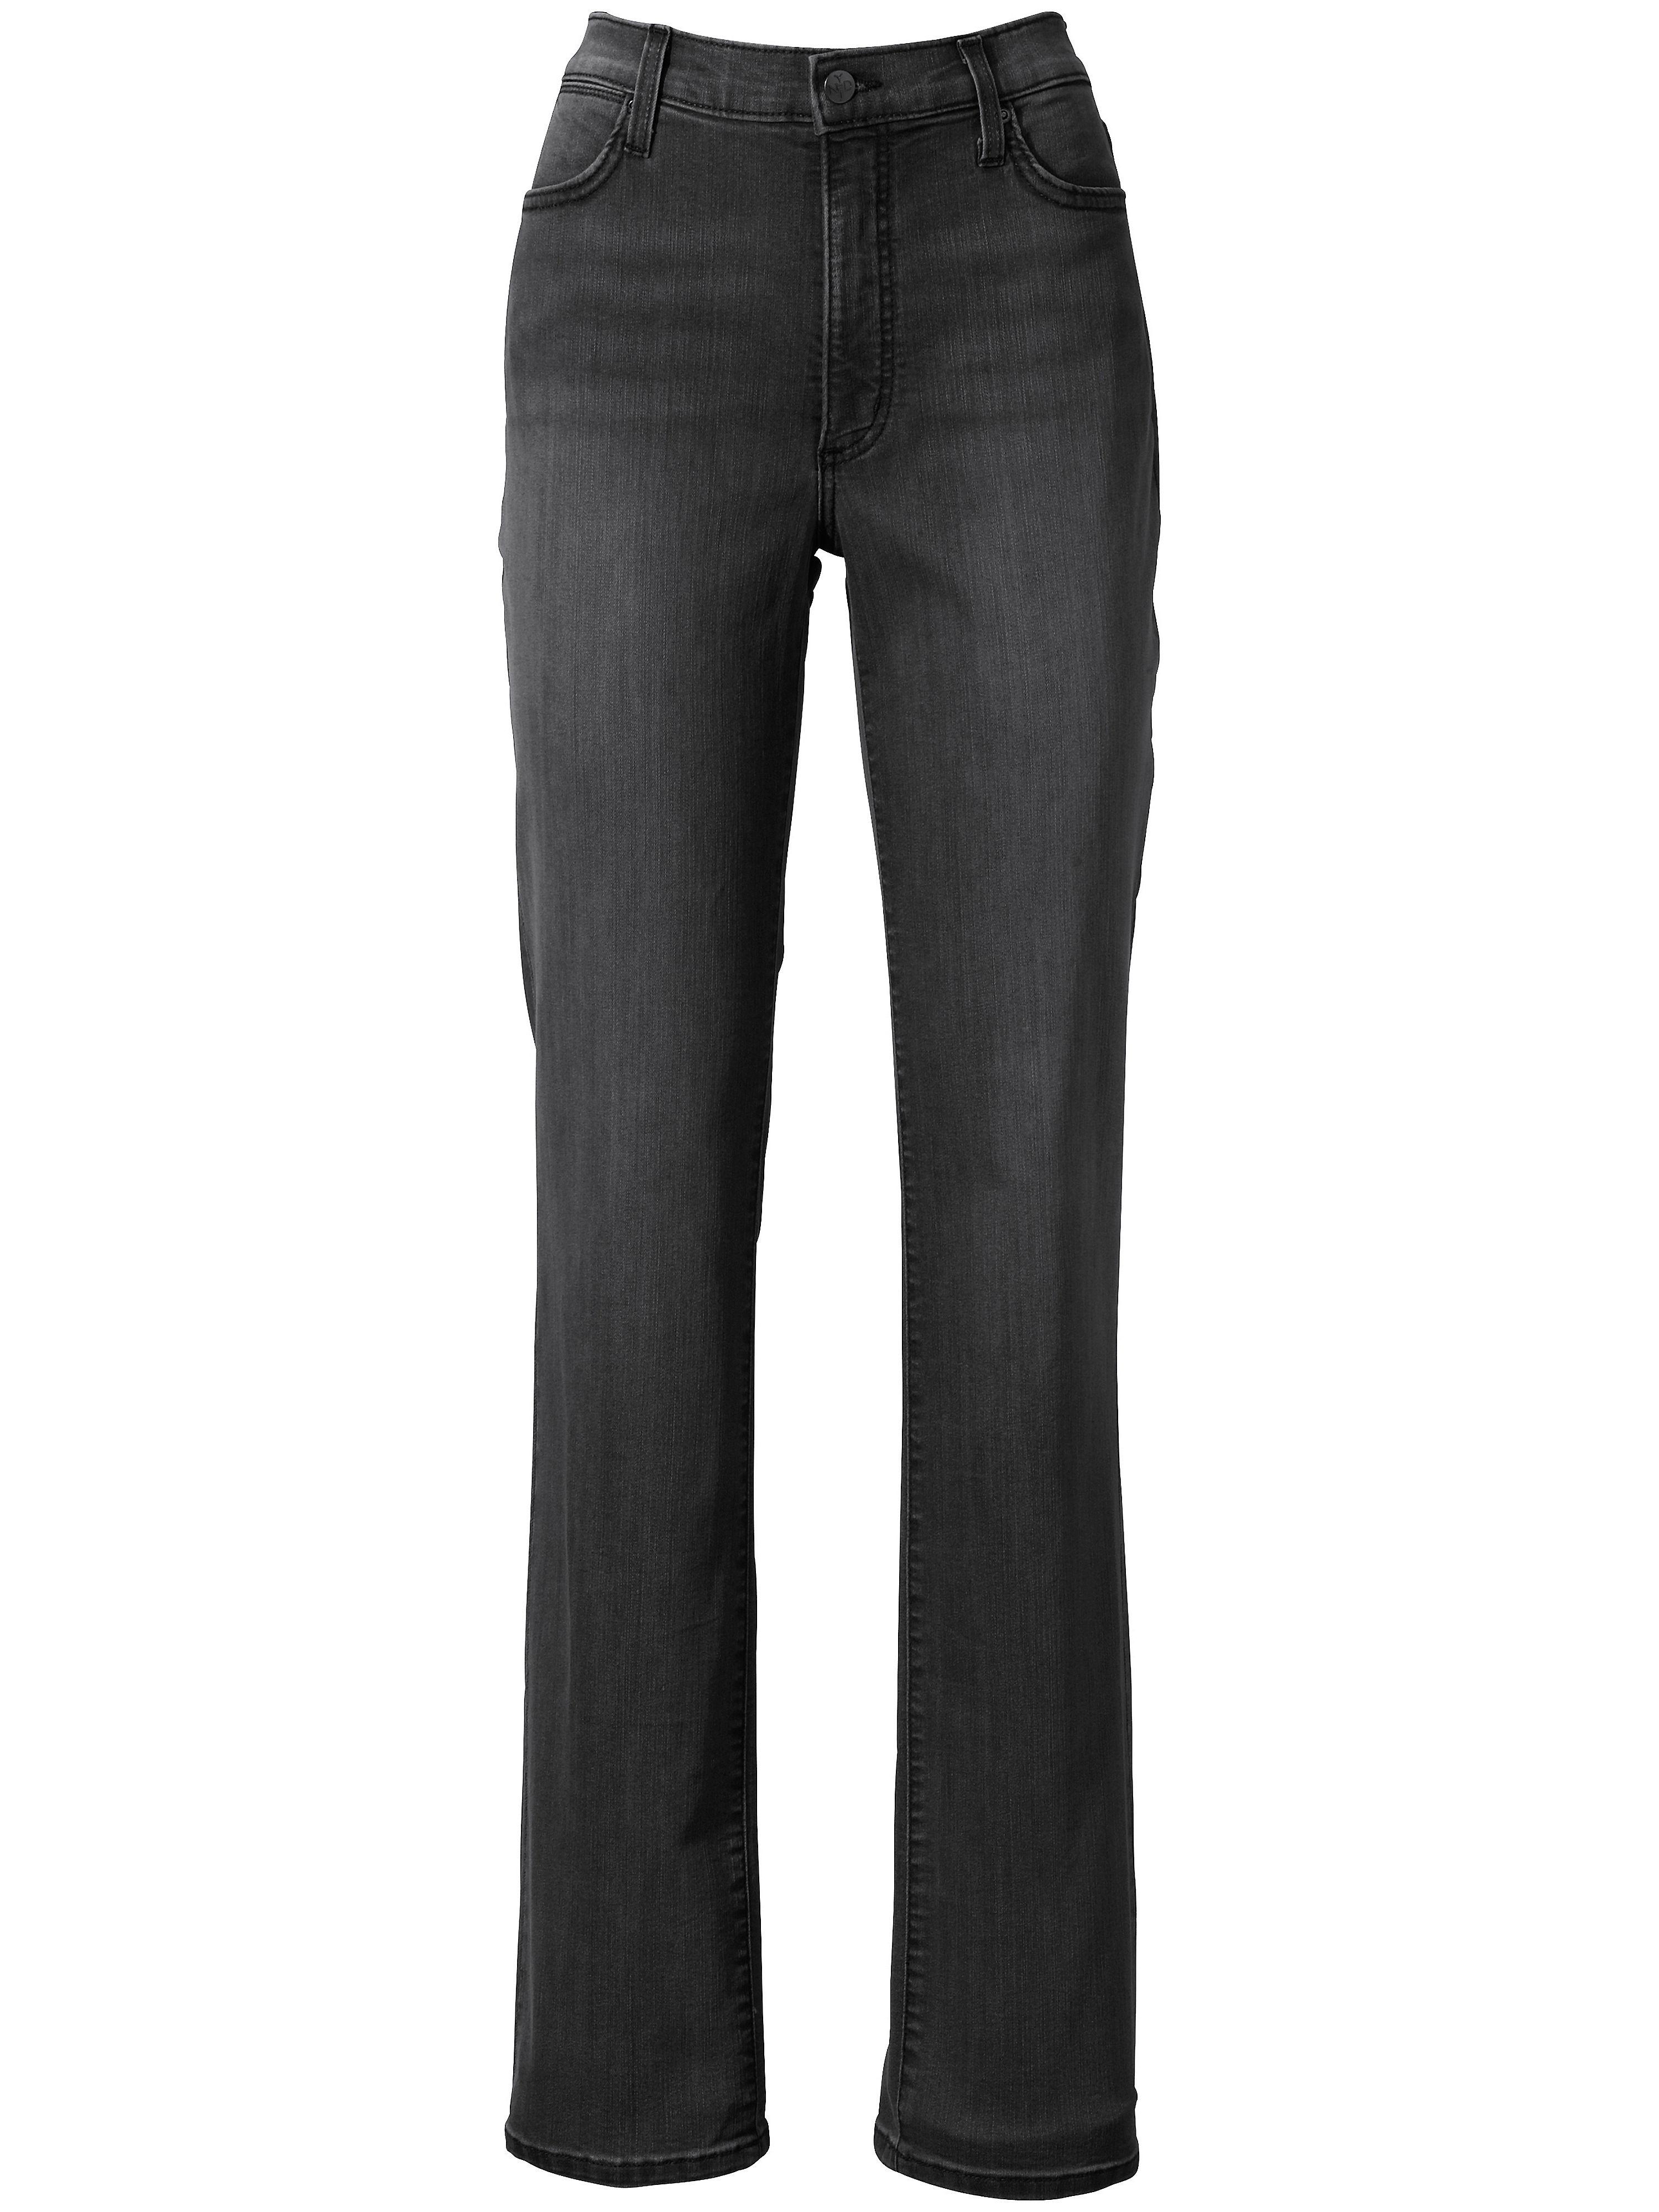 bei Peter Hahn: Jeans STRAIGHT Inch-Länge 33 NYDJ grau - Kurzgrößen